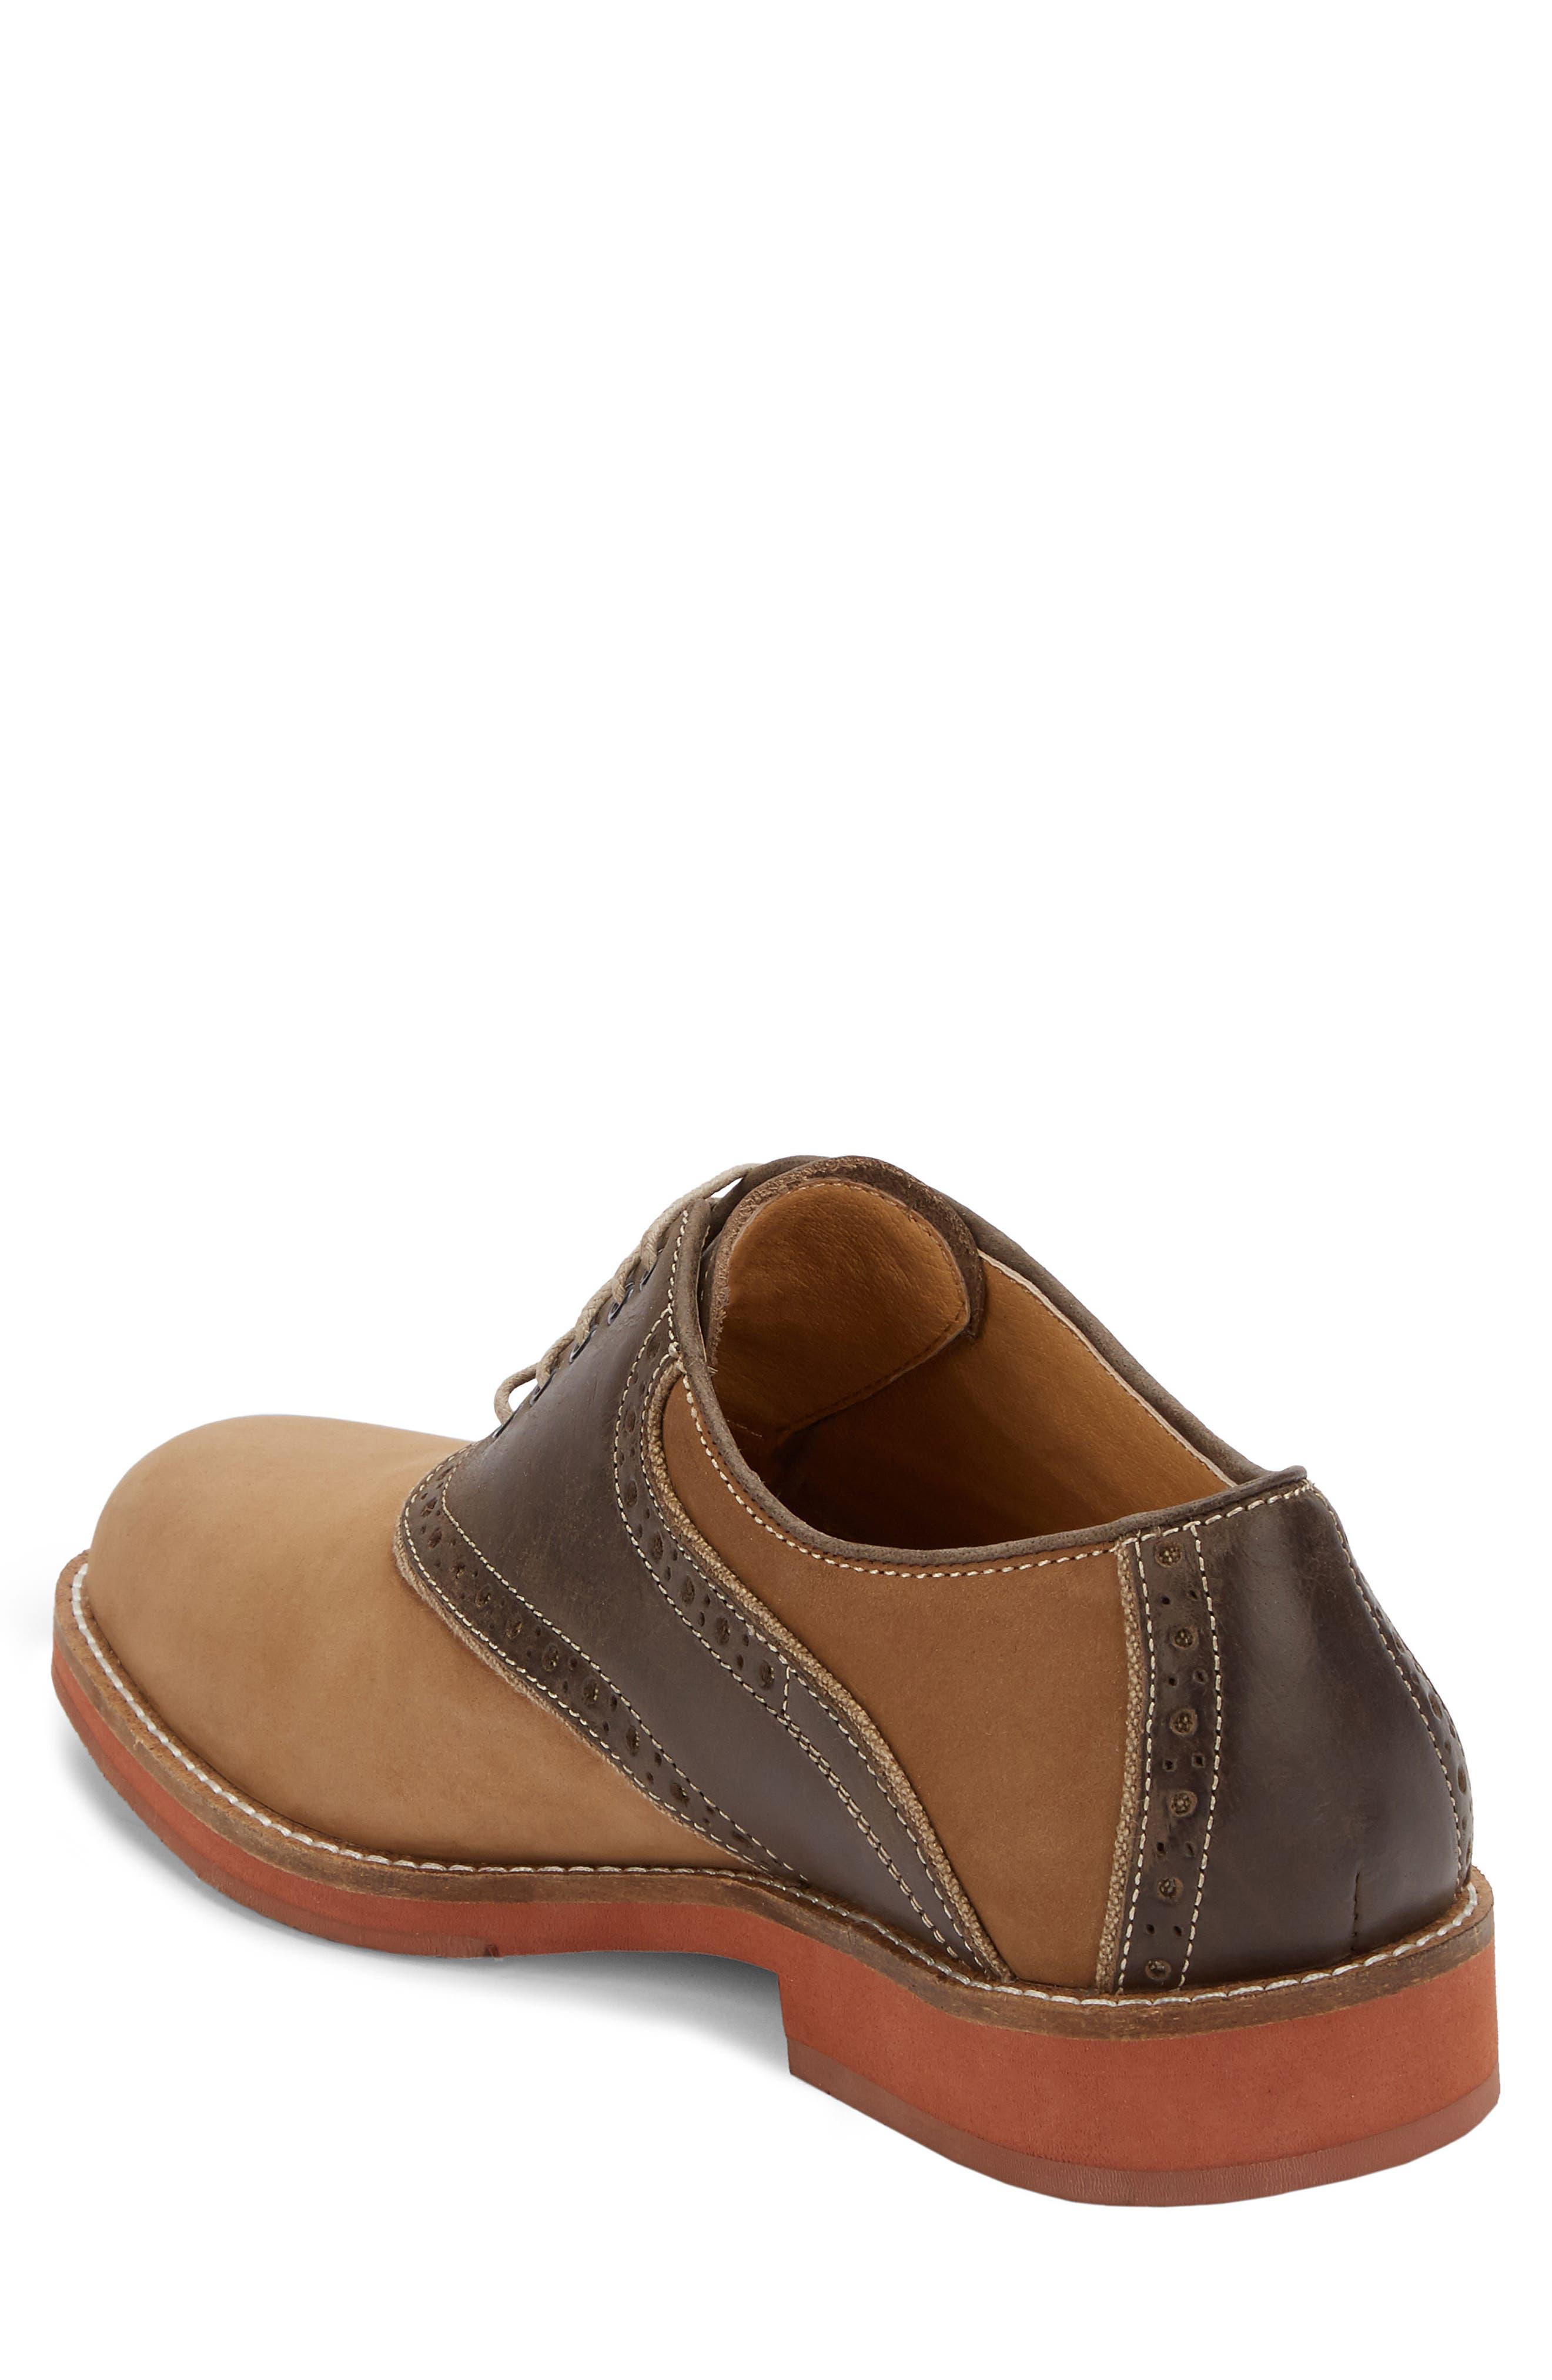 Alternate Image 2  - G.H. Bass & Co. Noah Saddle Shoe (Men)